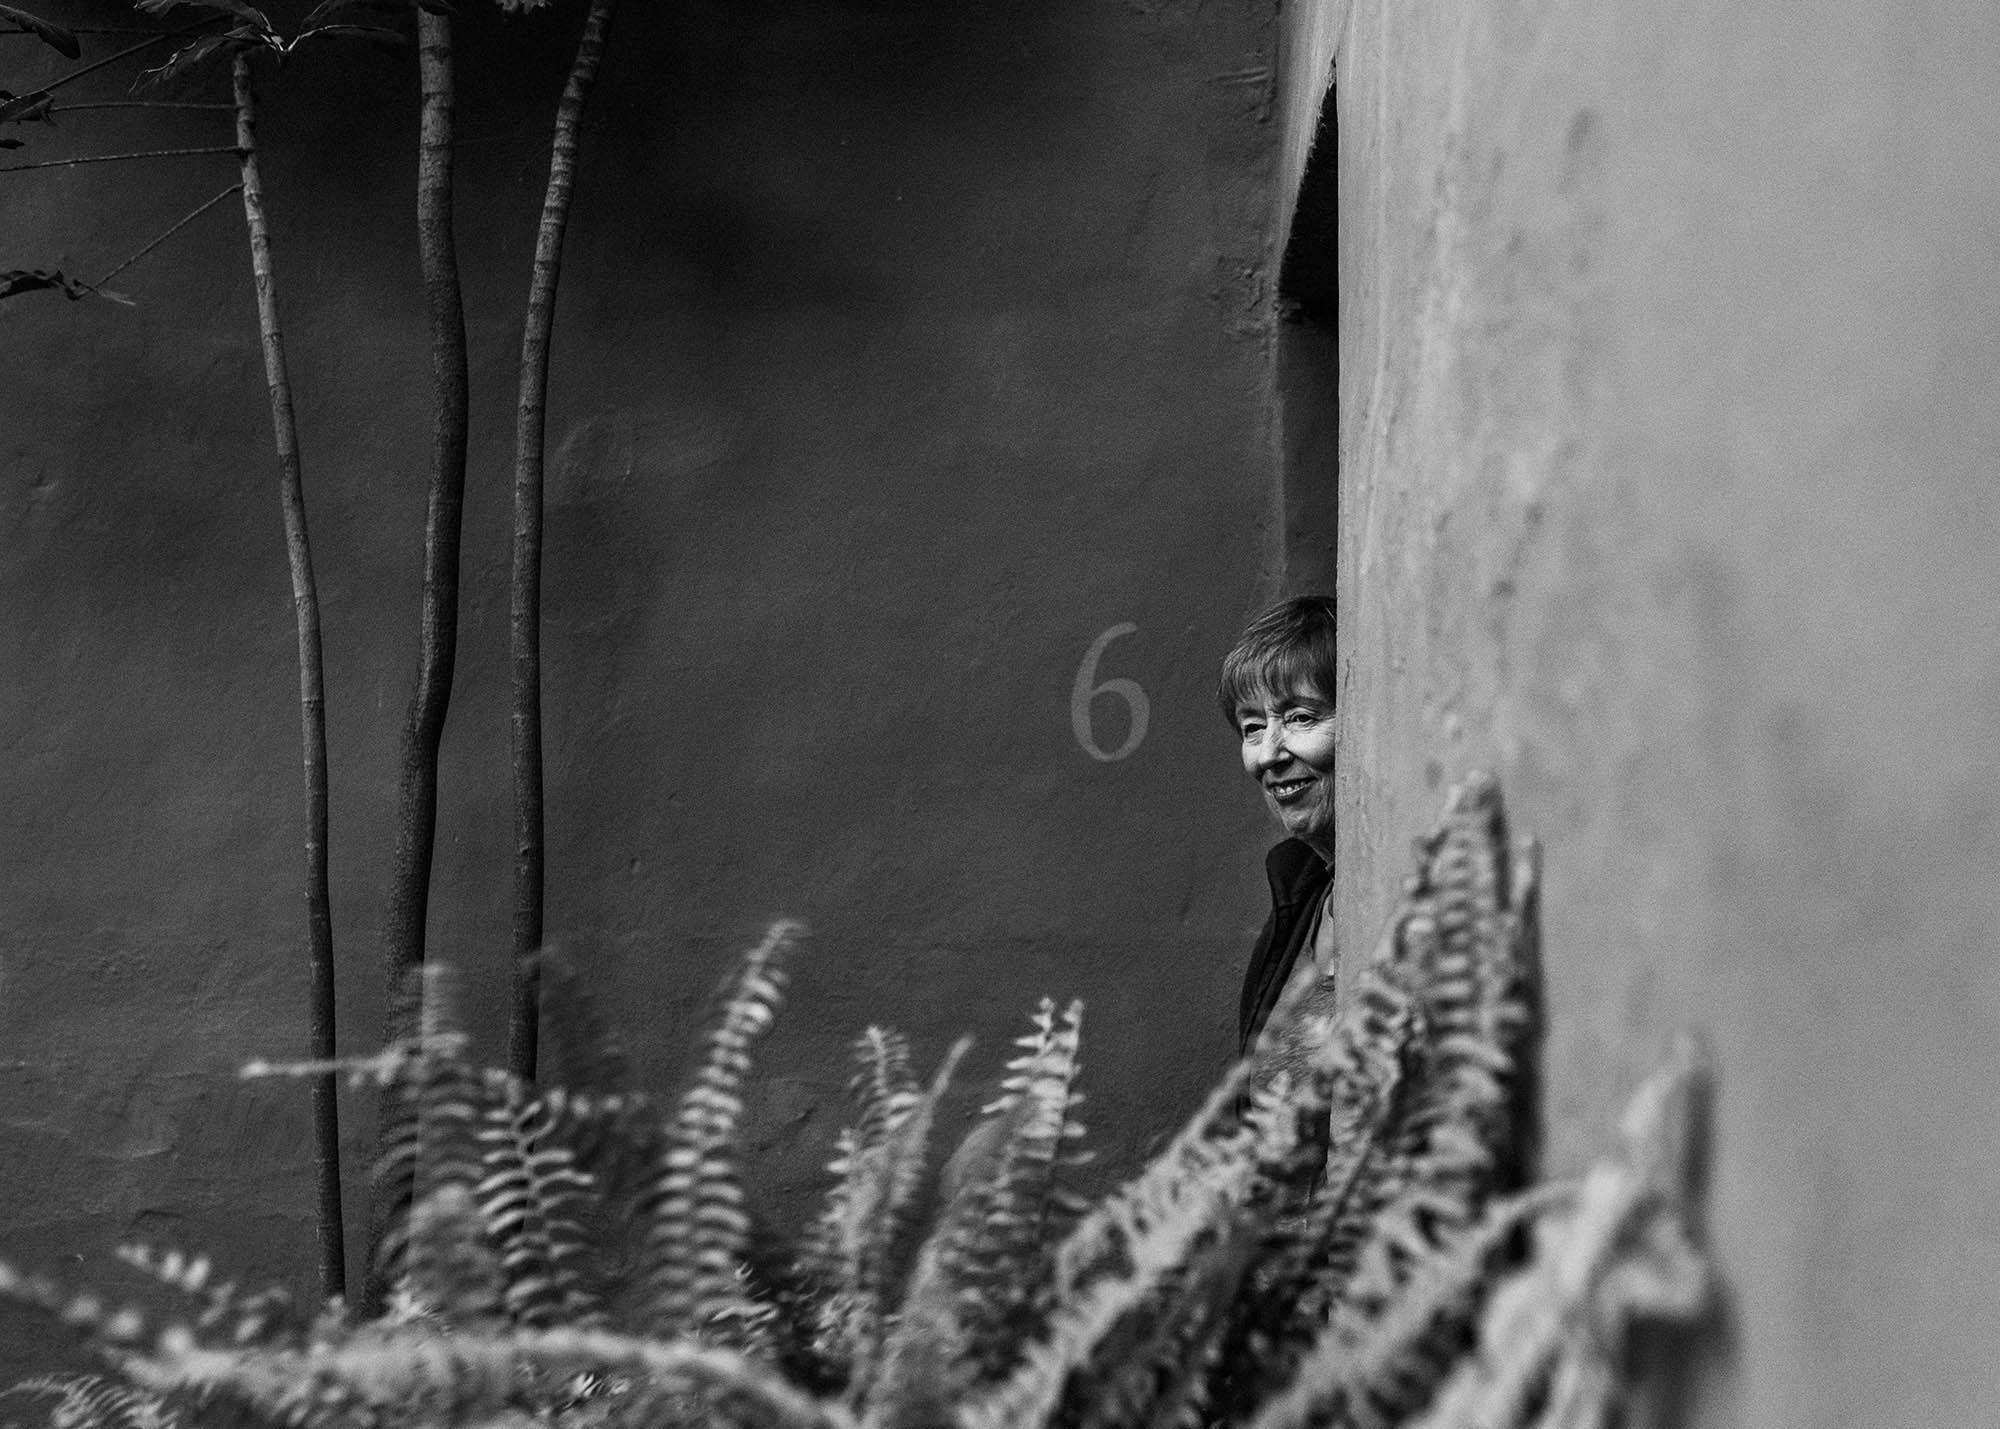 fotografo_de_bodas_san_miguel_allende_gto_6.JPG